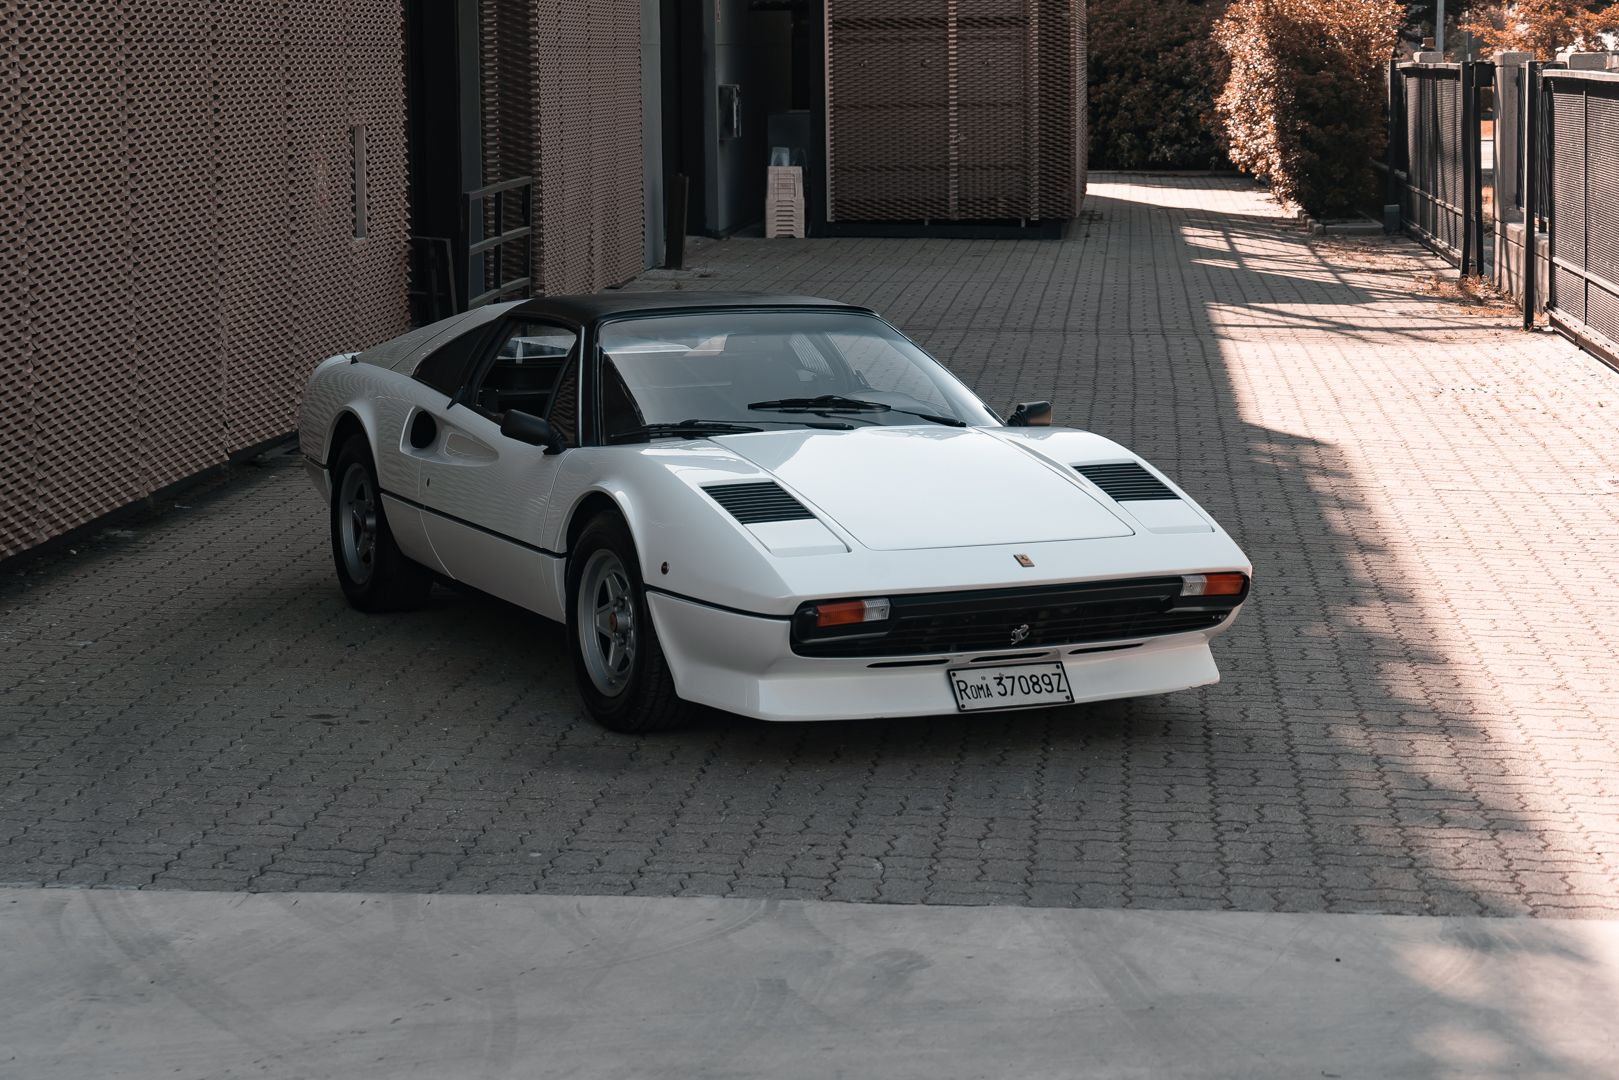 1982 Ferrari 208 GTS Carburatori 75993